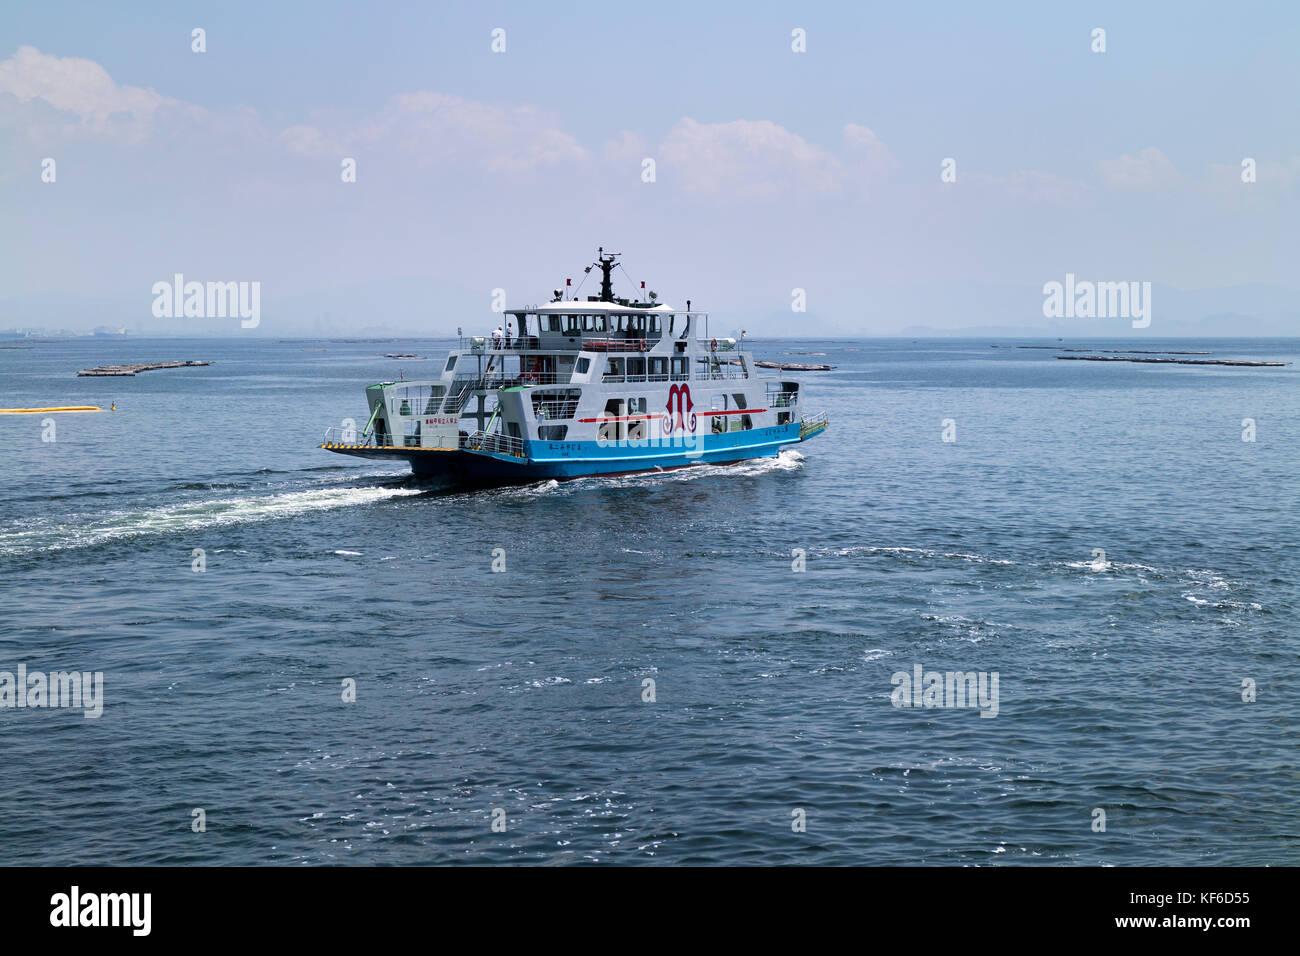 Hiroshima, Japan -  May 26, 2017: A ferry on Seto Inland Sea running to Miyajima Island in Hiroshima, Japan - Stock Image